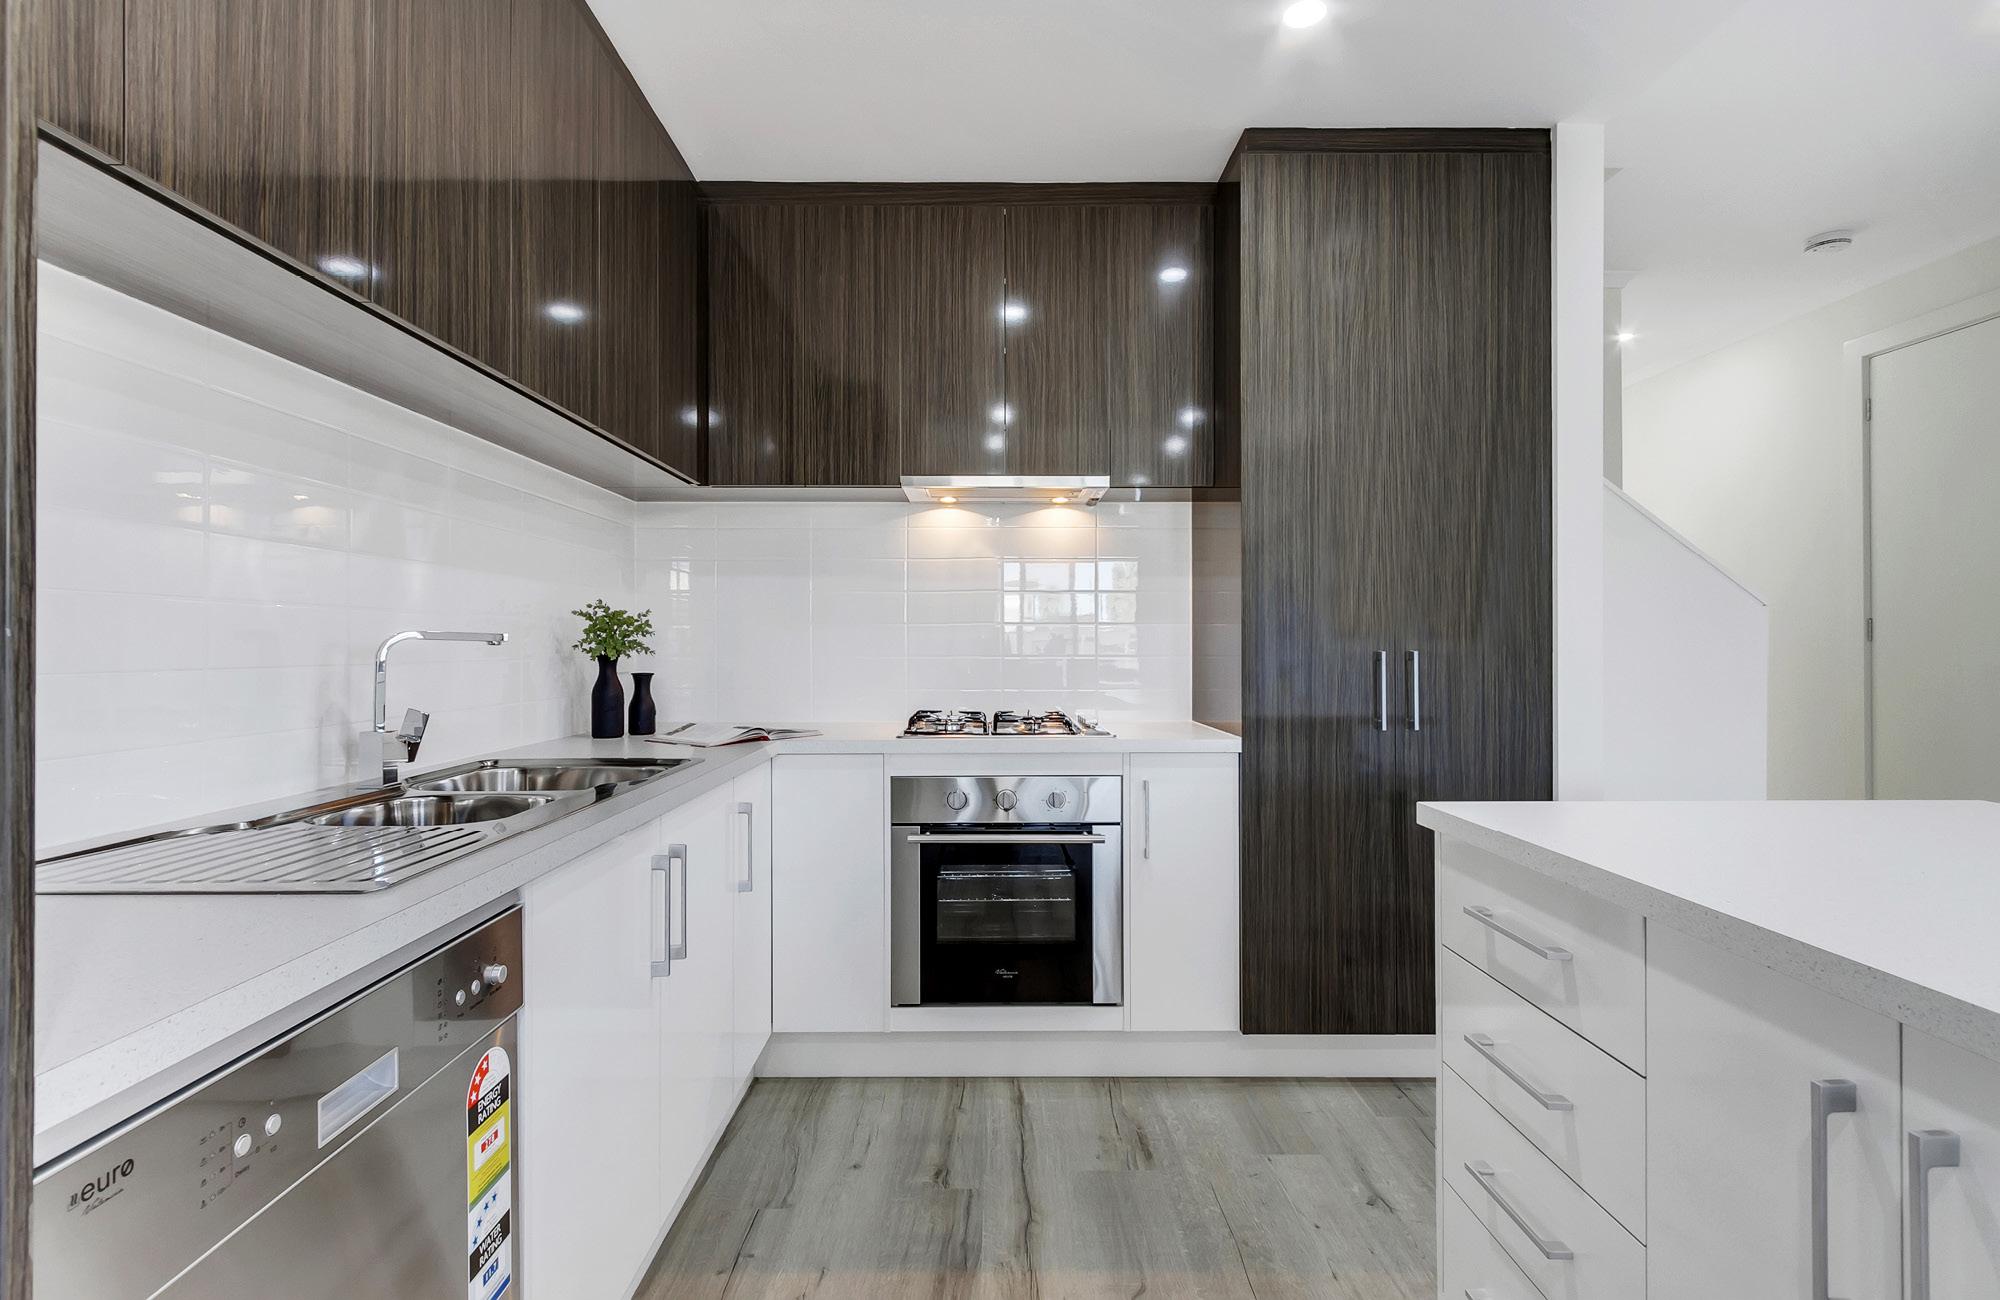 Morphettville Property Development Kitchen